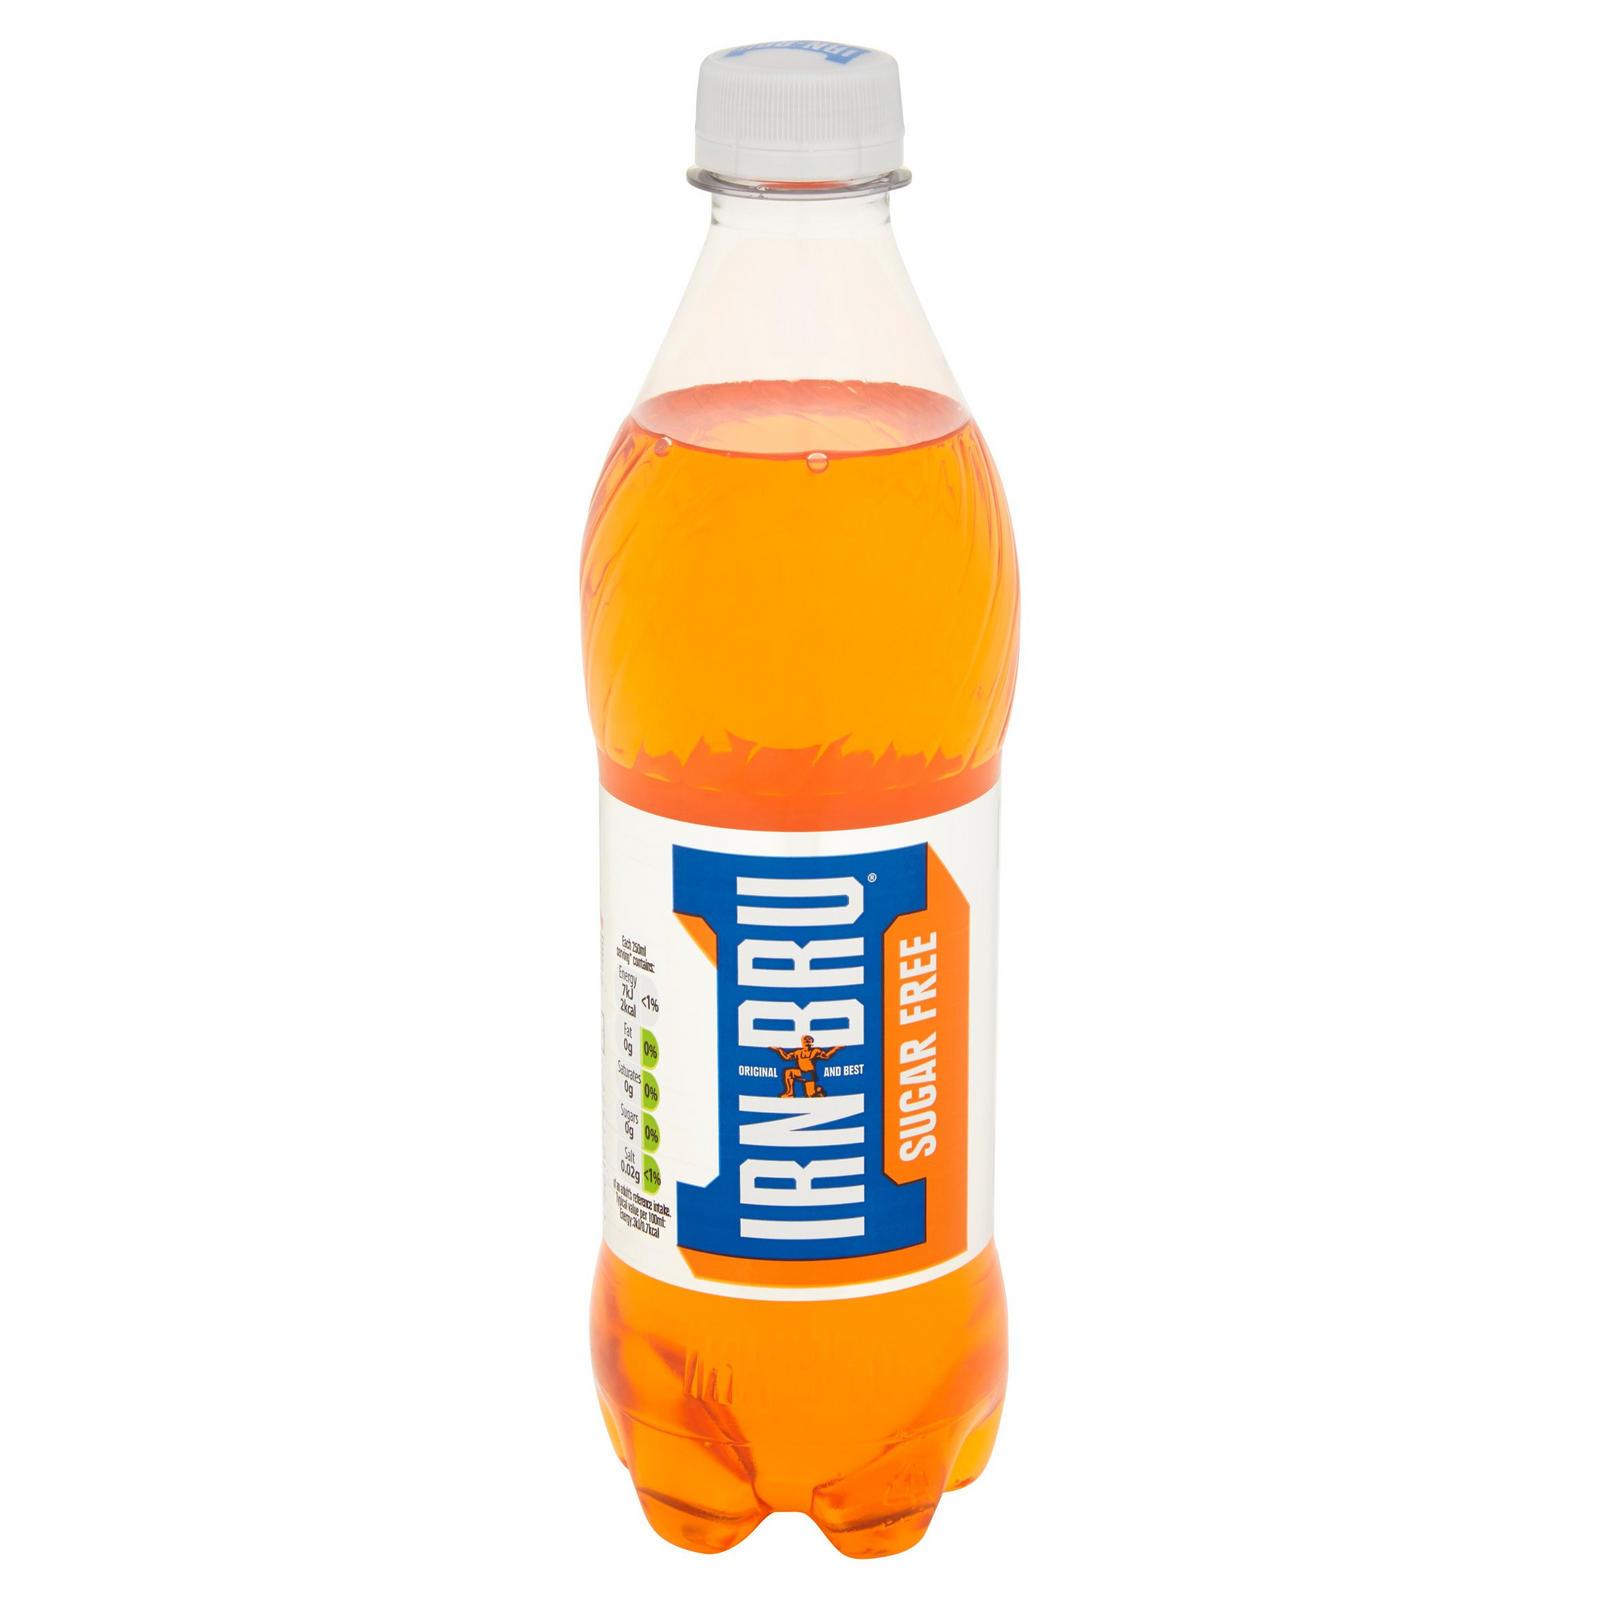 IRN-BRU 500ml Bottle   Bottled Drinks   Iceland Foods